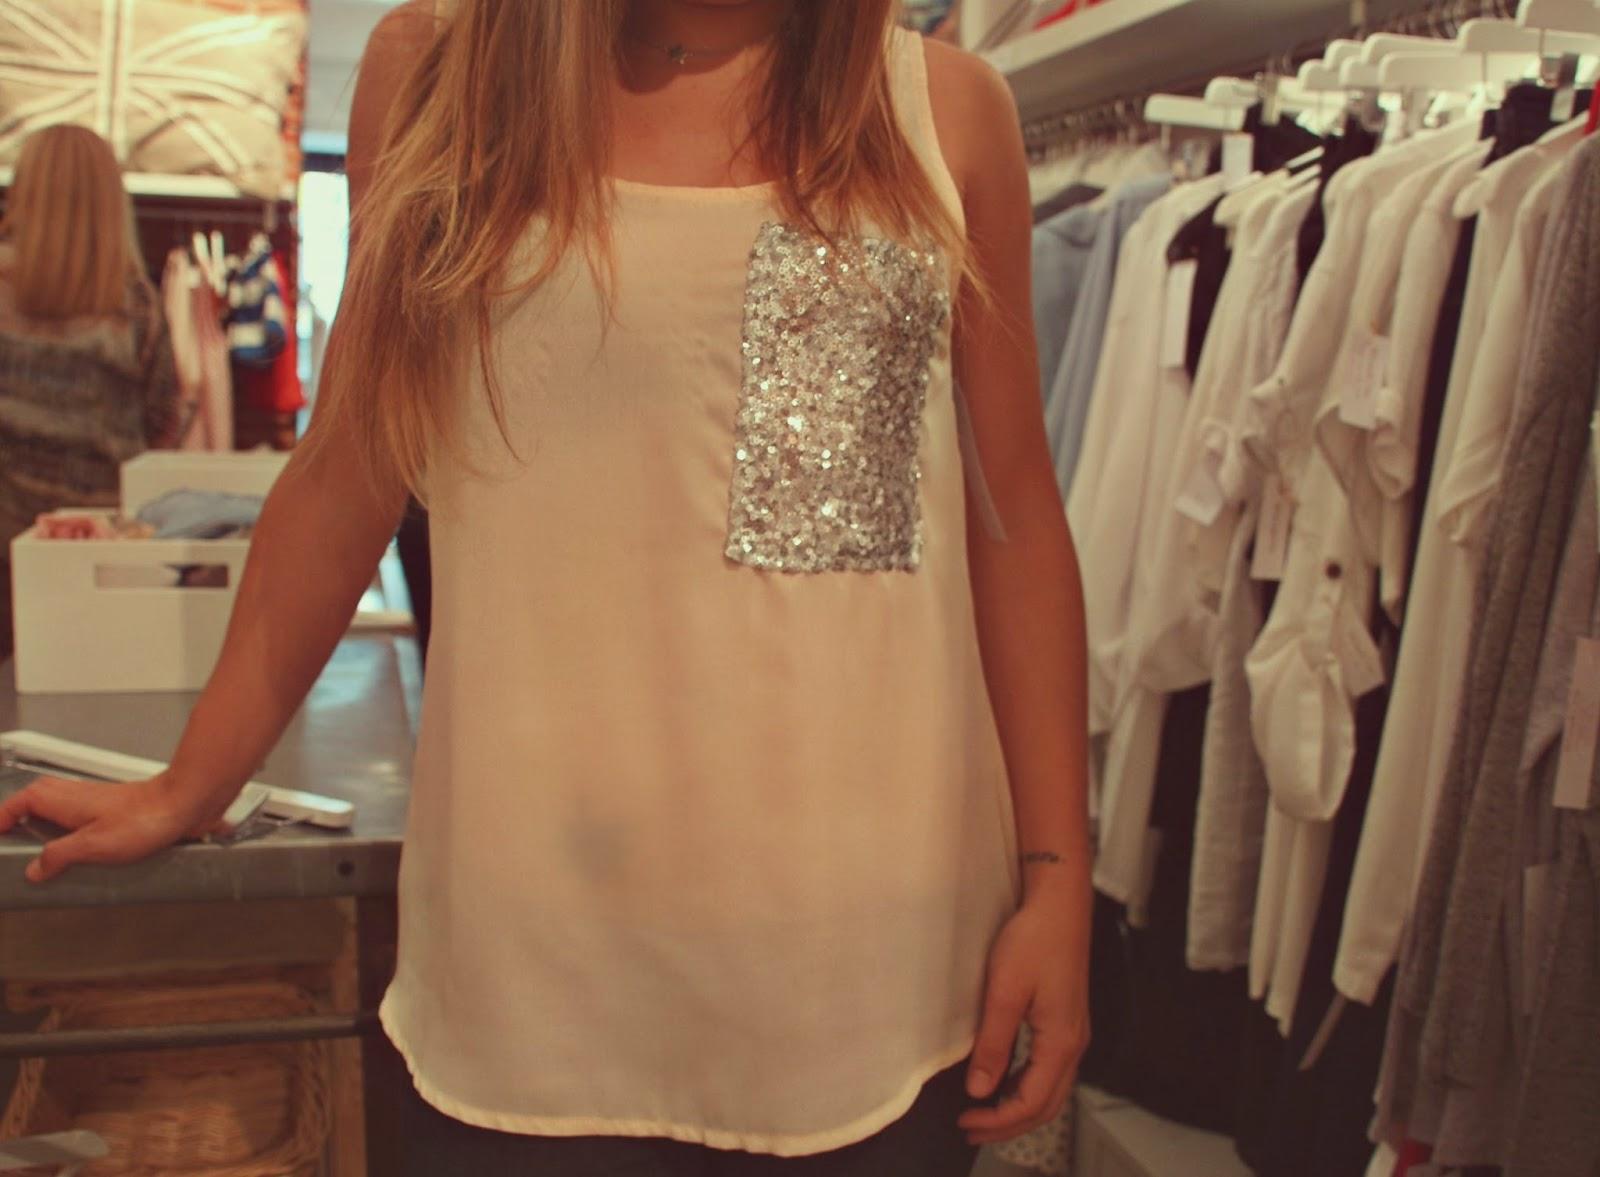 white&one,blusa,rosa pastel,bolsillo lentejuelas,chic,juvenil